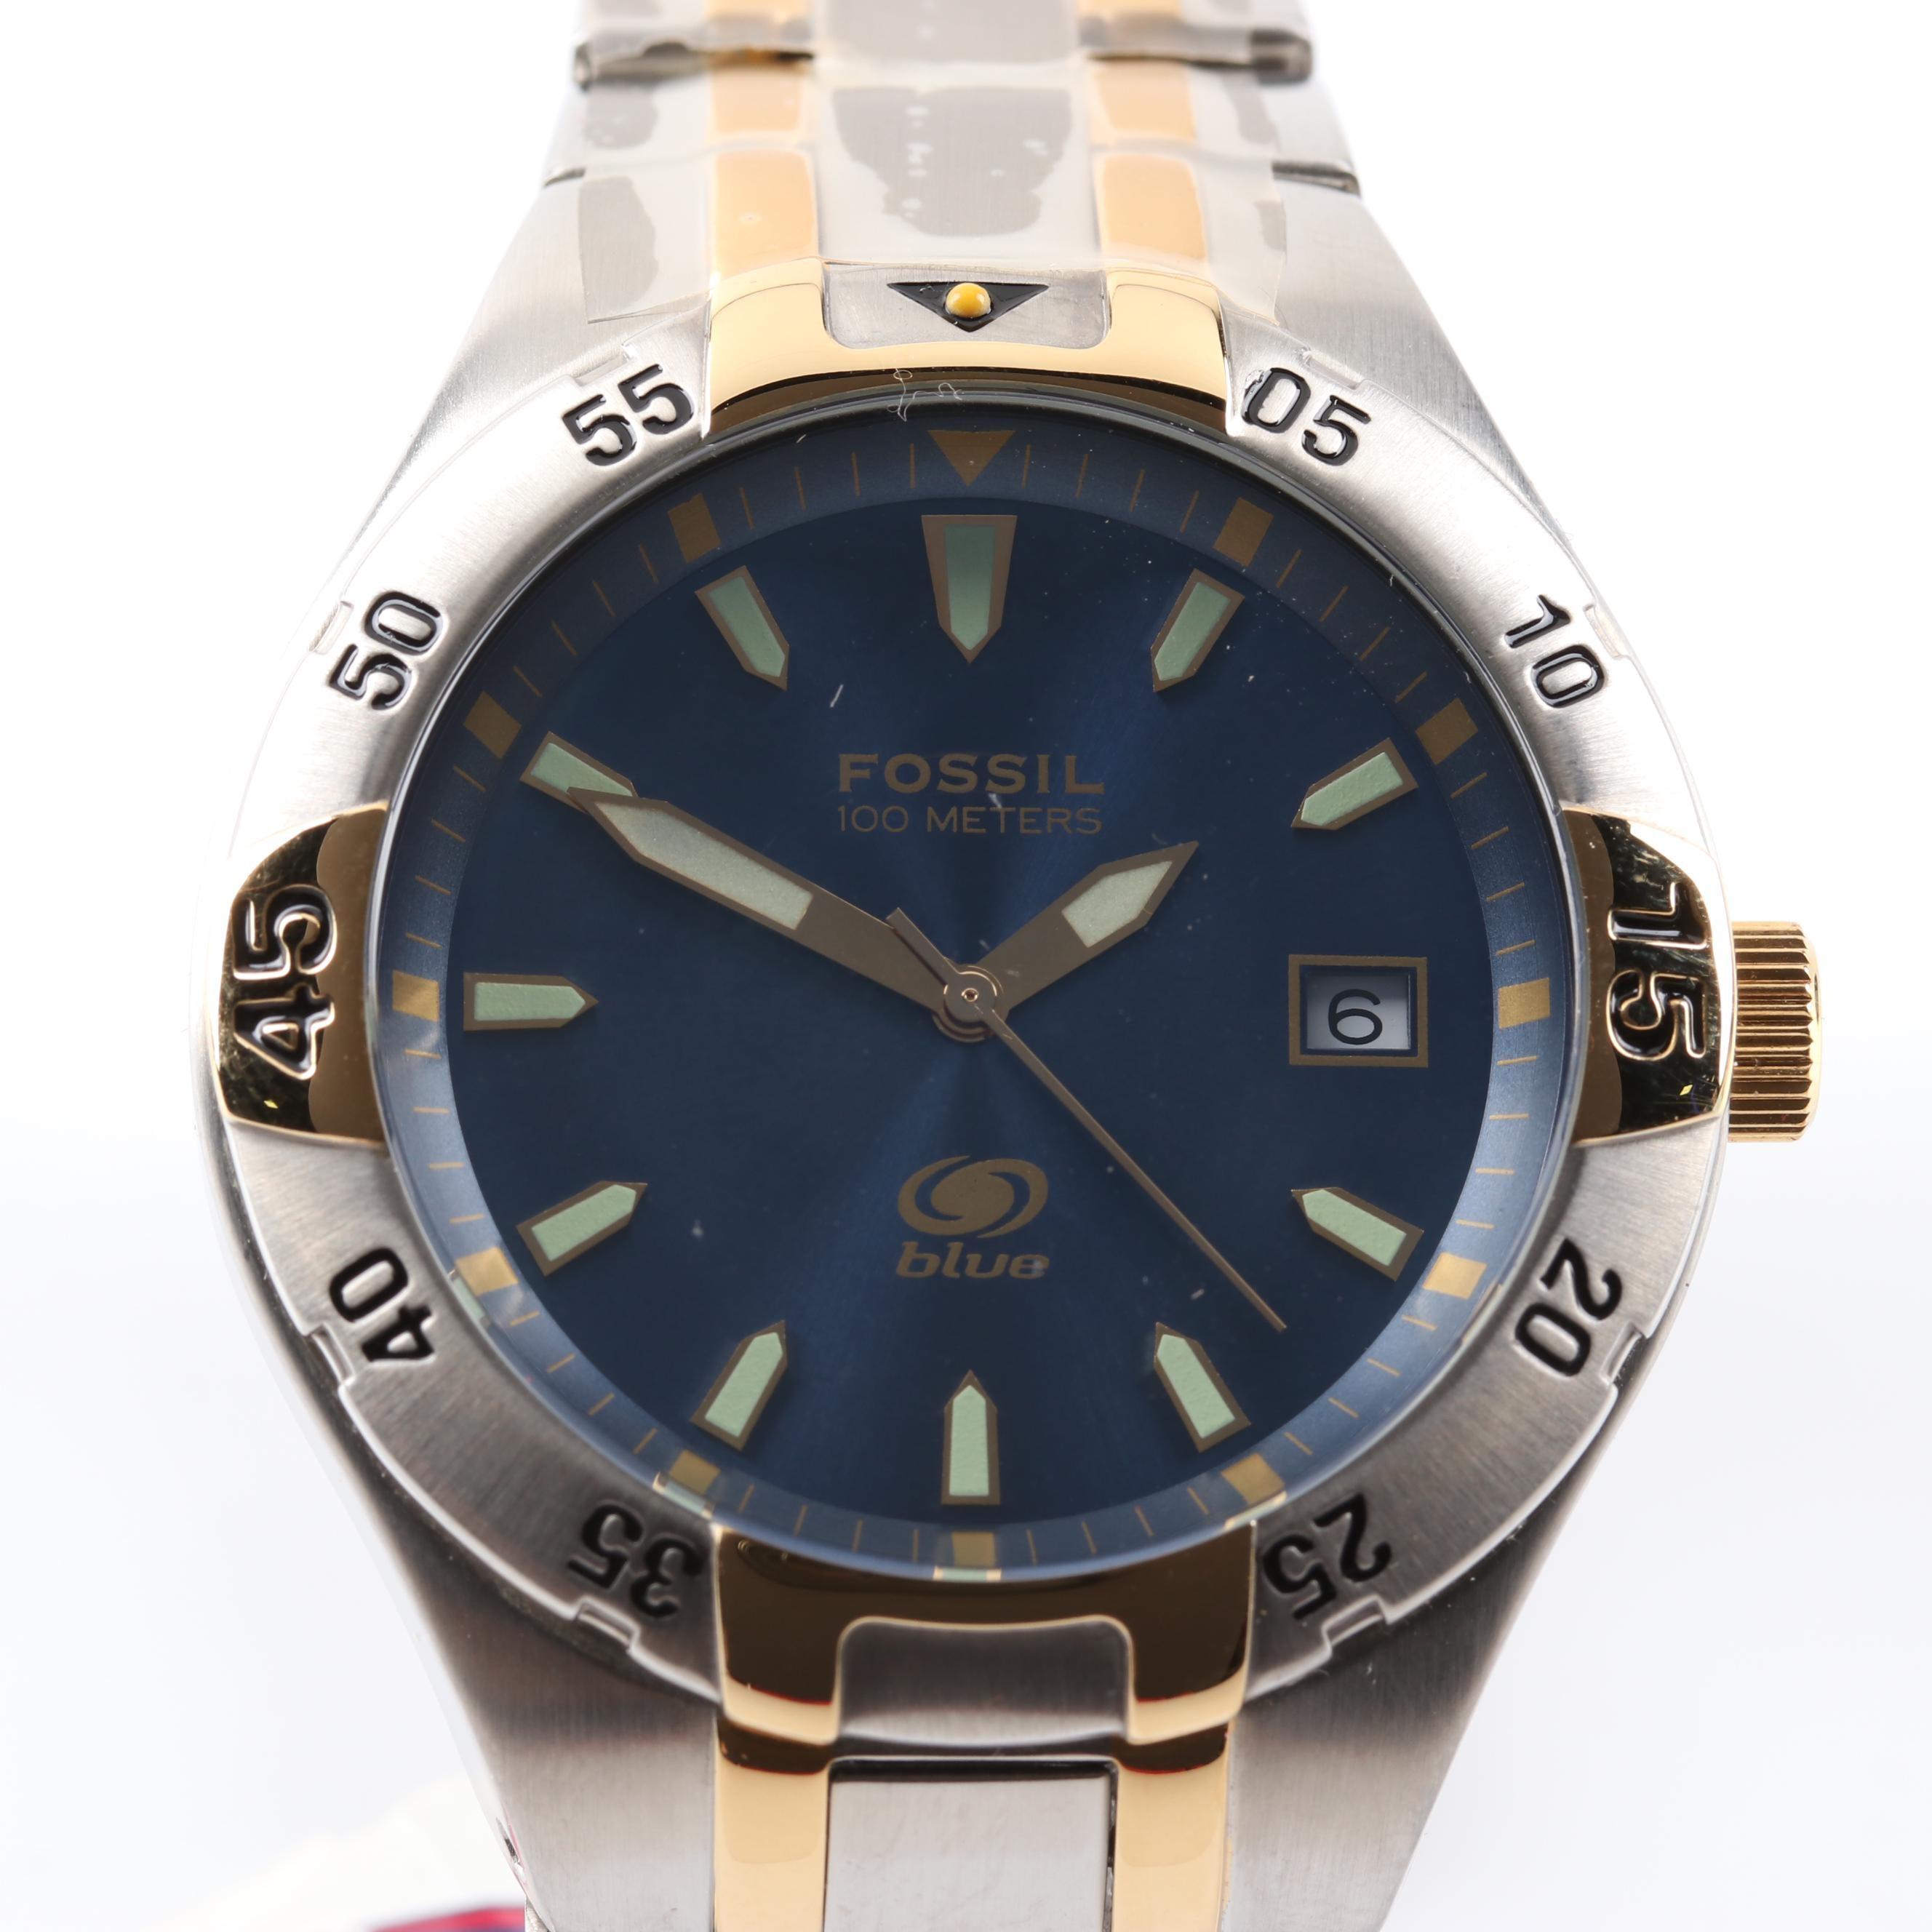 Fossil Blue Wristwatch